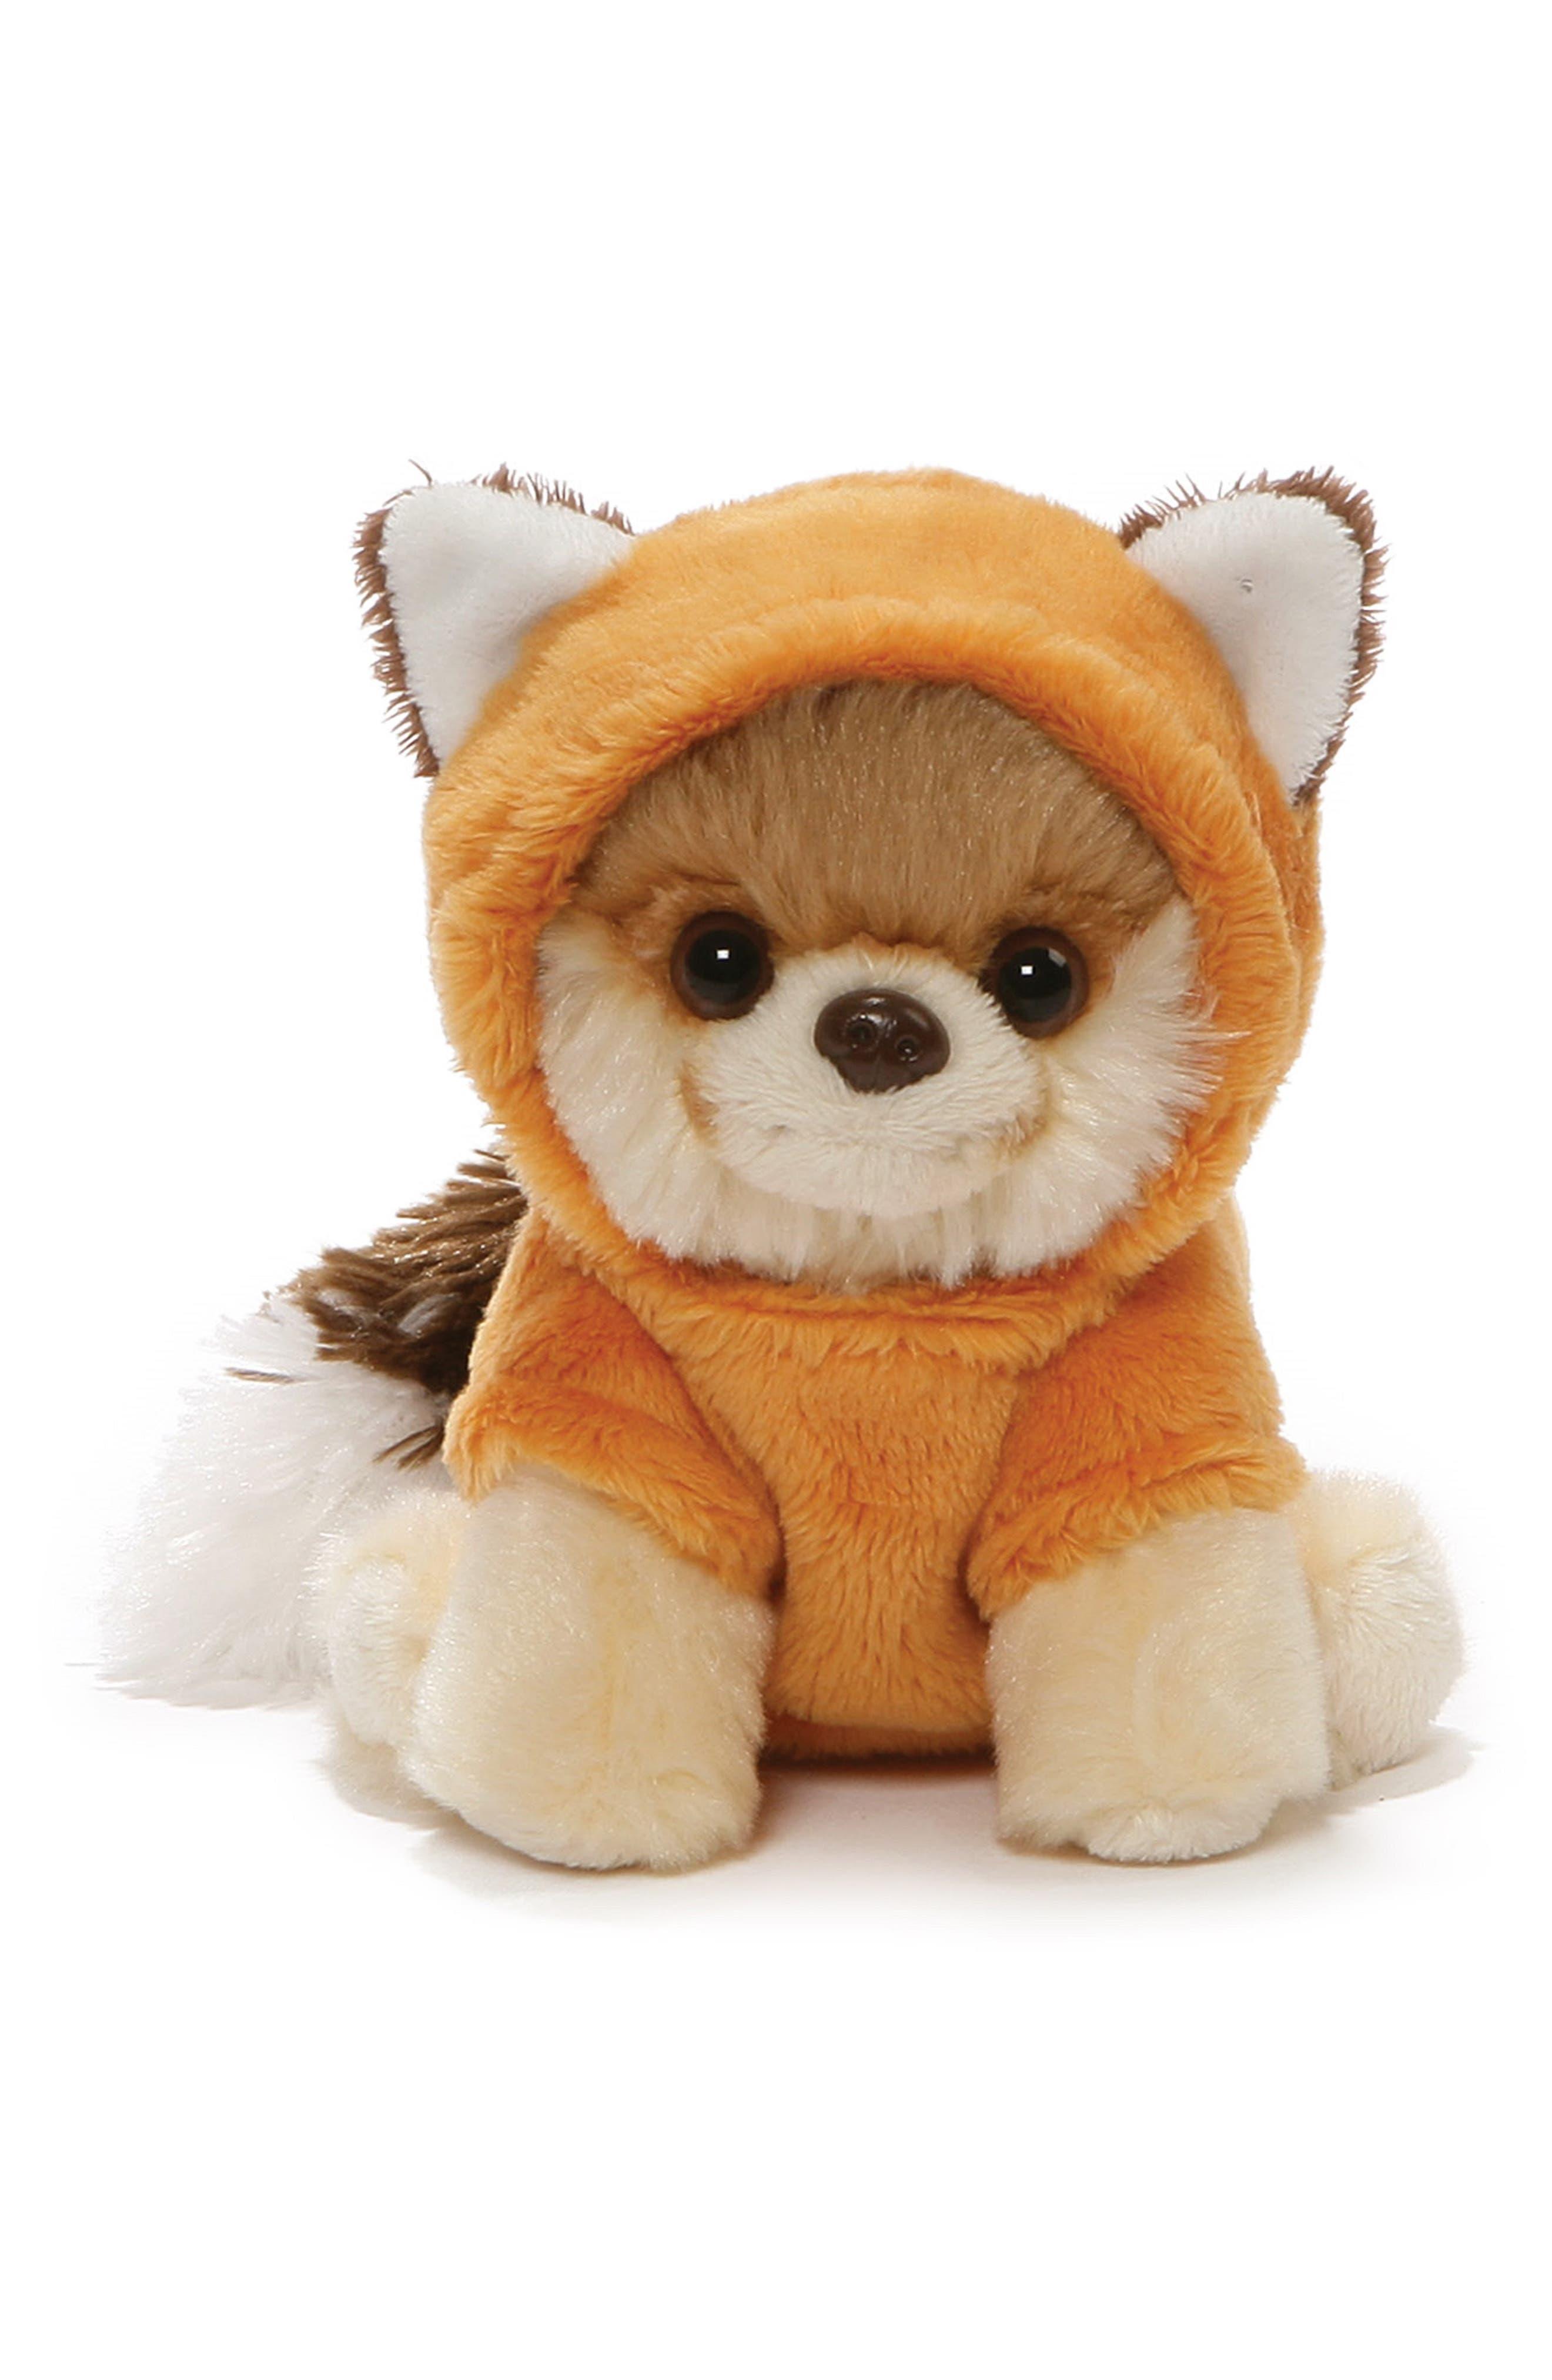 Itty Bitty Boo Fox Stuffed Animal,                             Main thumbnail 1, color,                             250